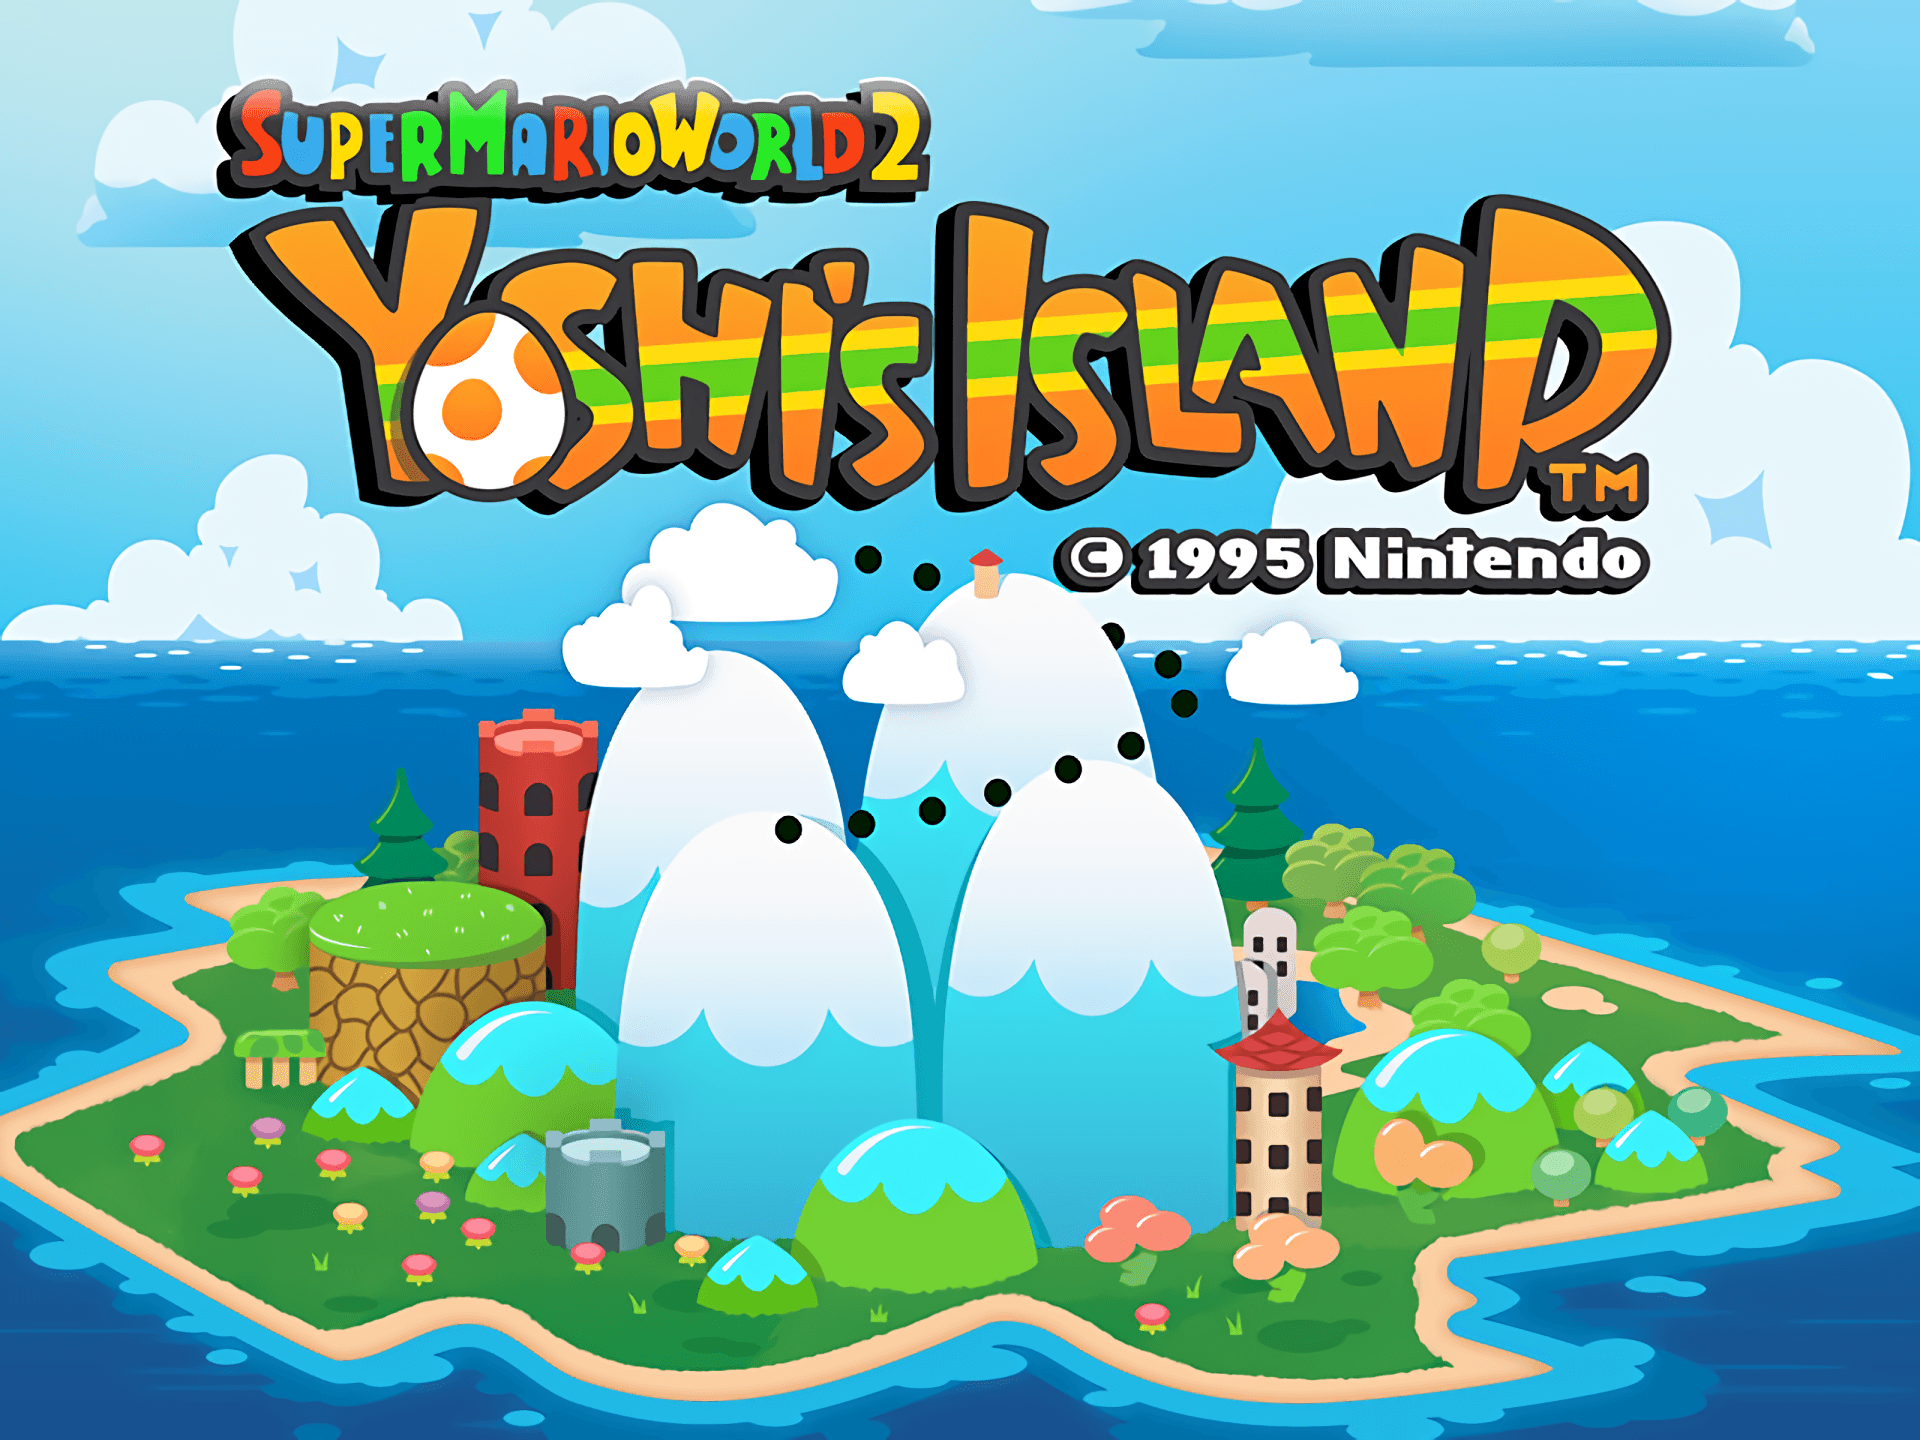 super mario world 2 yoshis island download free